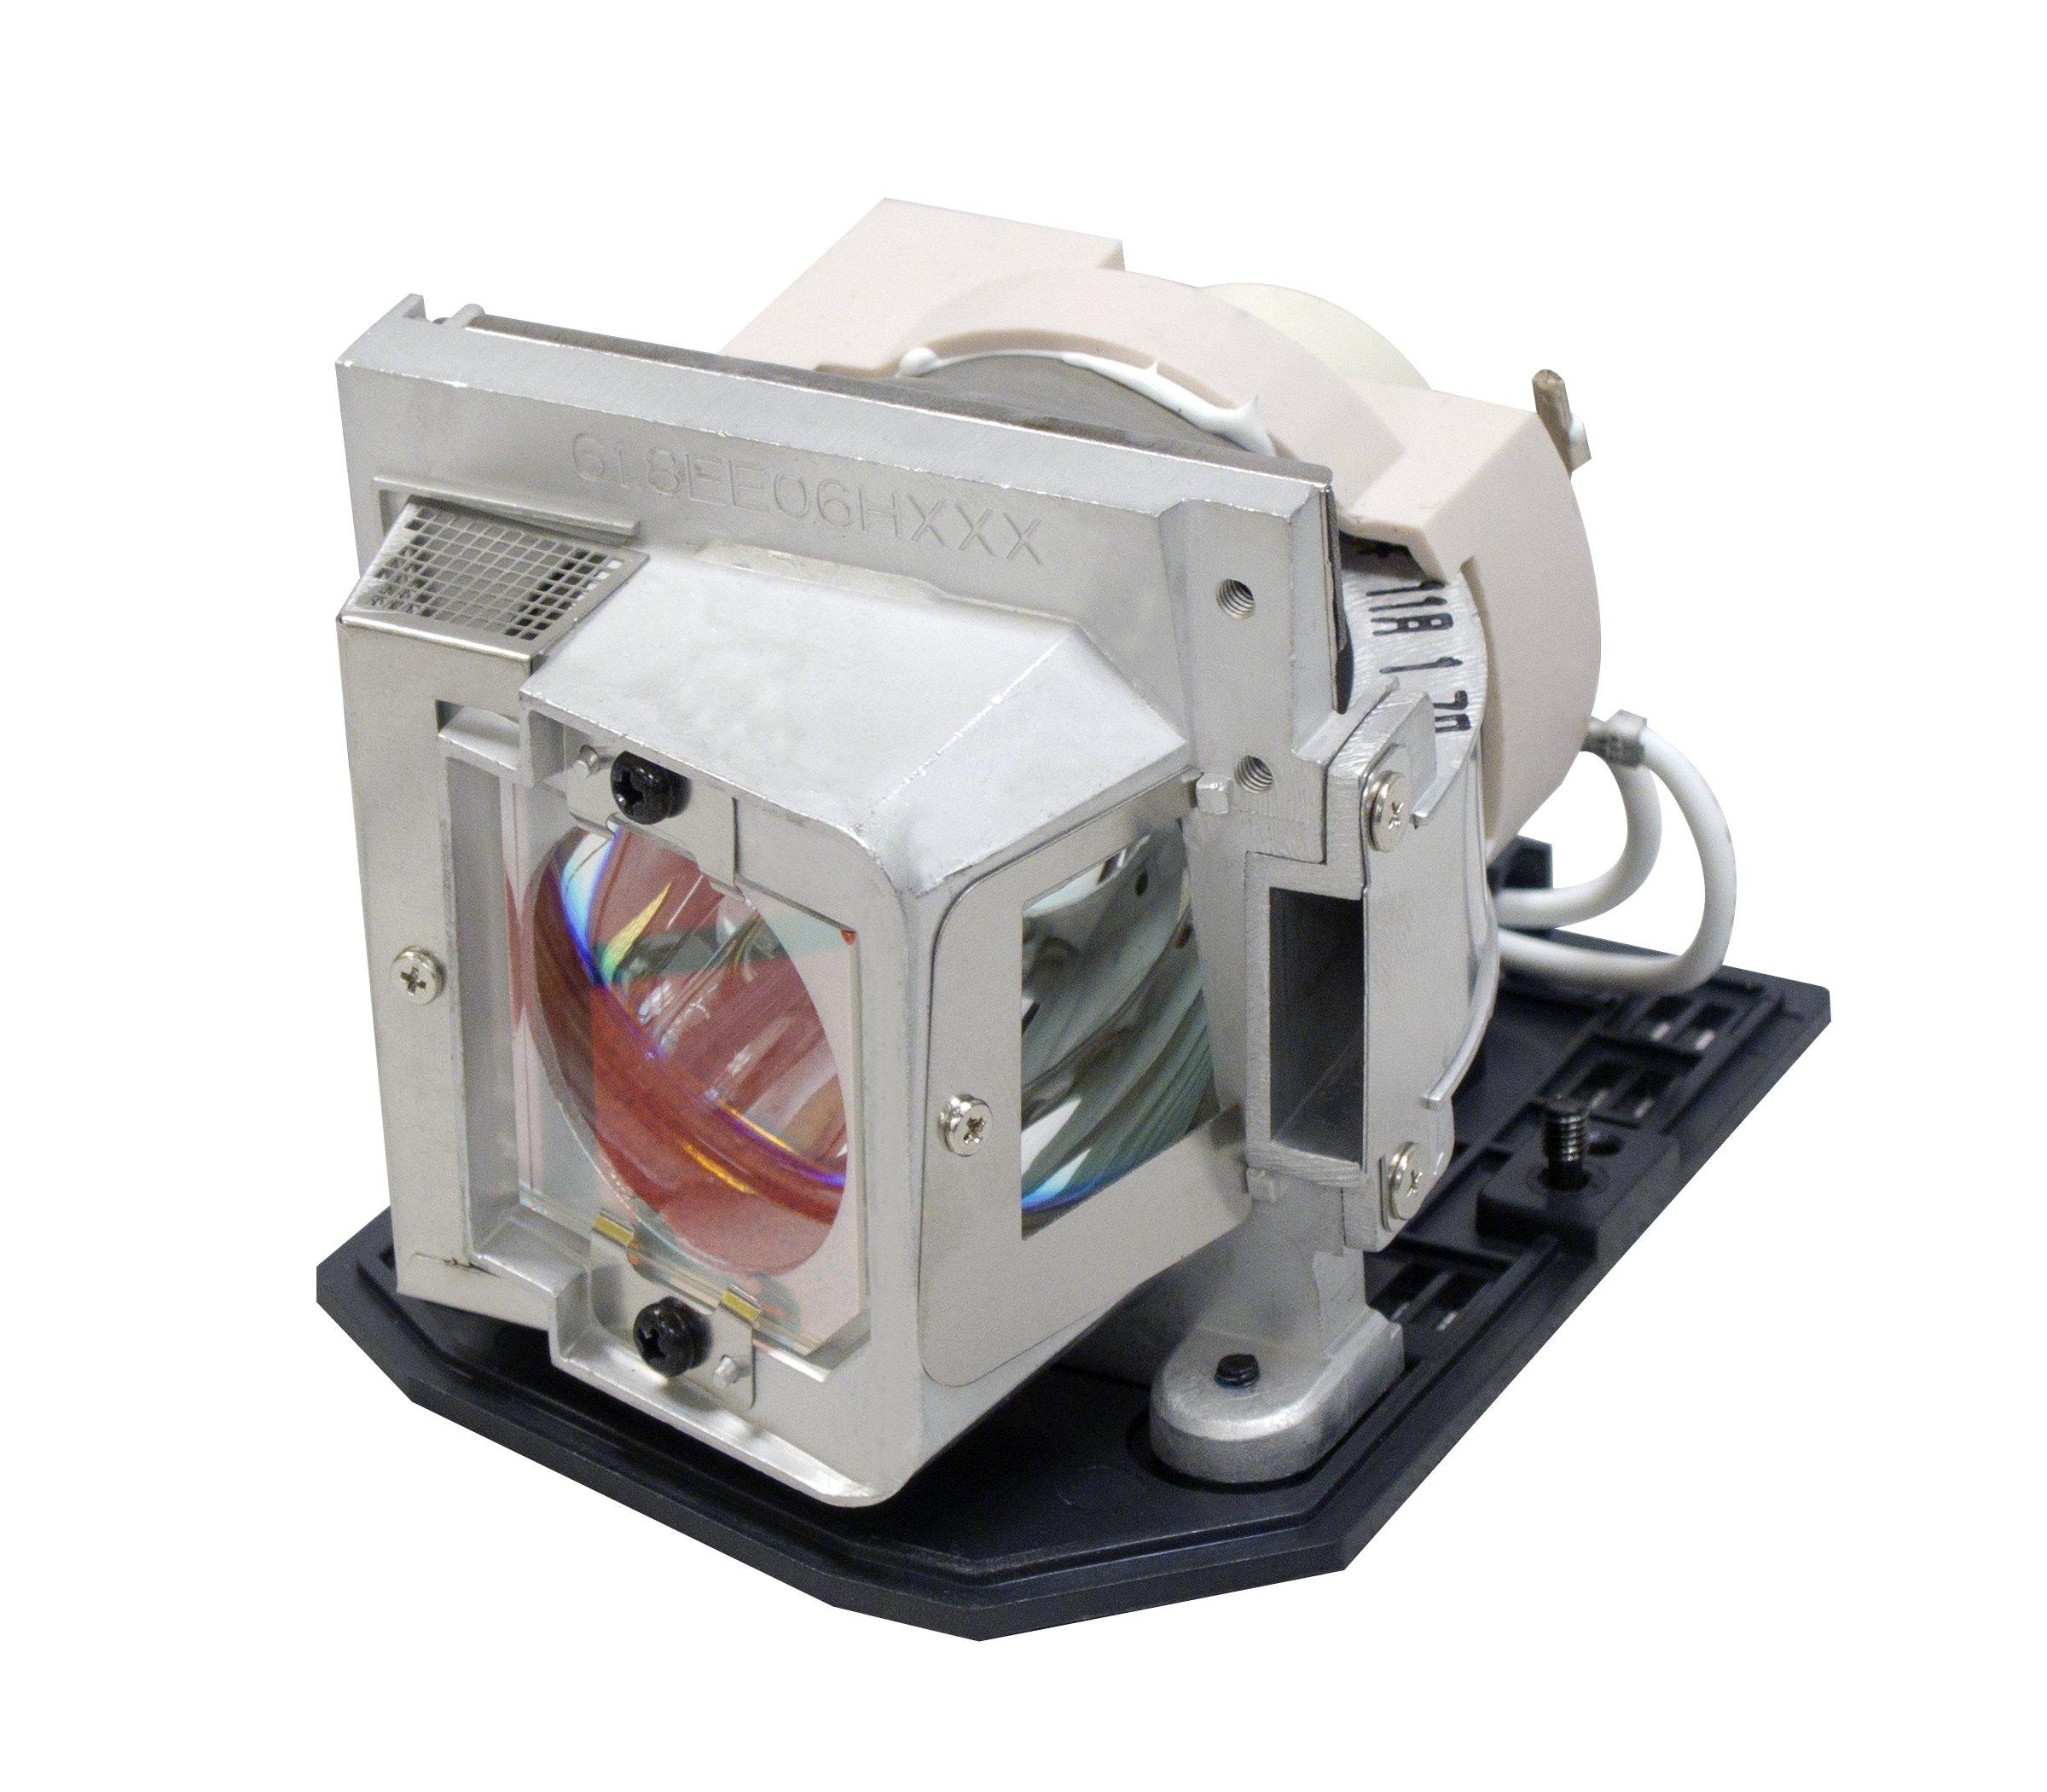 Optoma BL-FP280D, P-VIP, 280W Projector Lamp